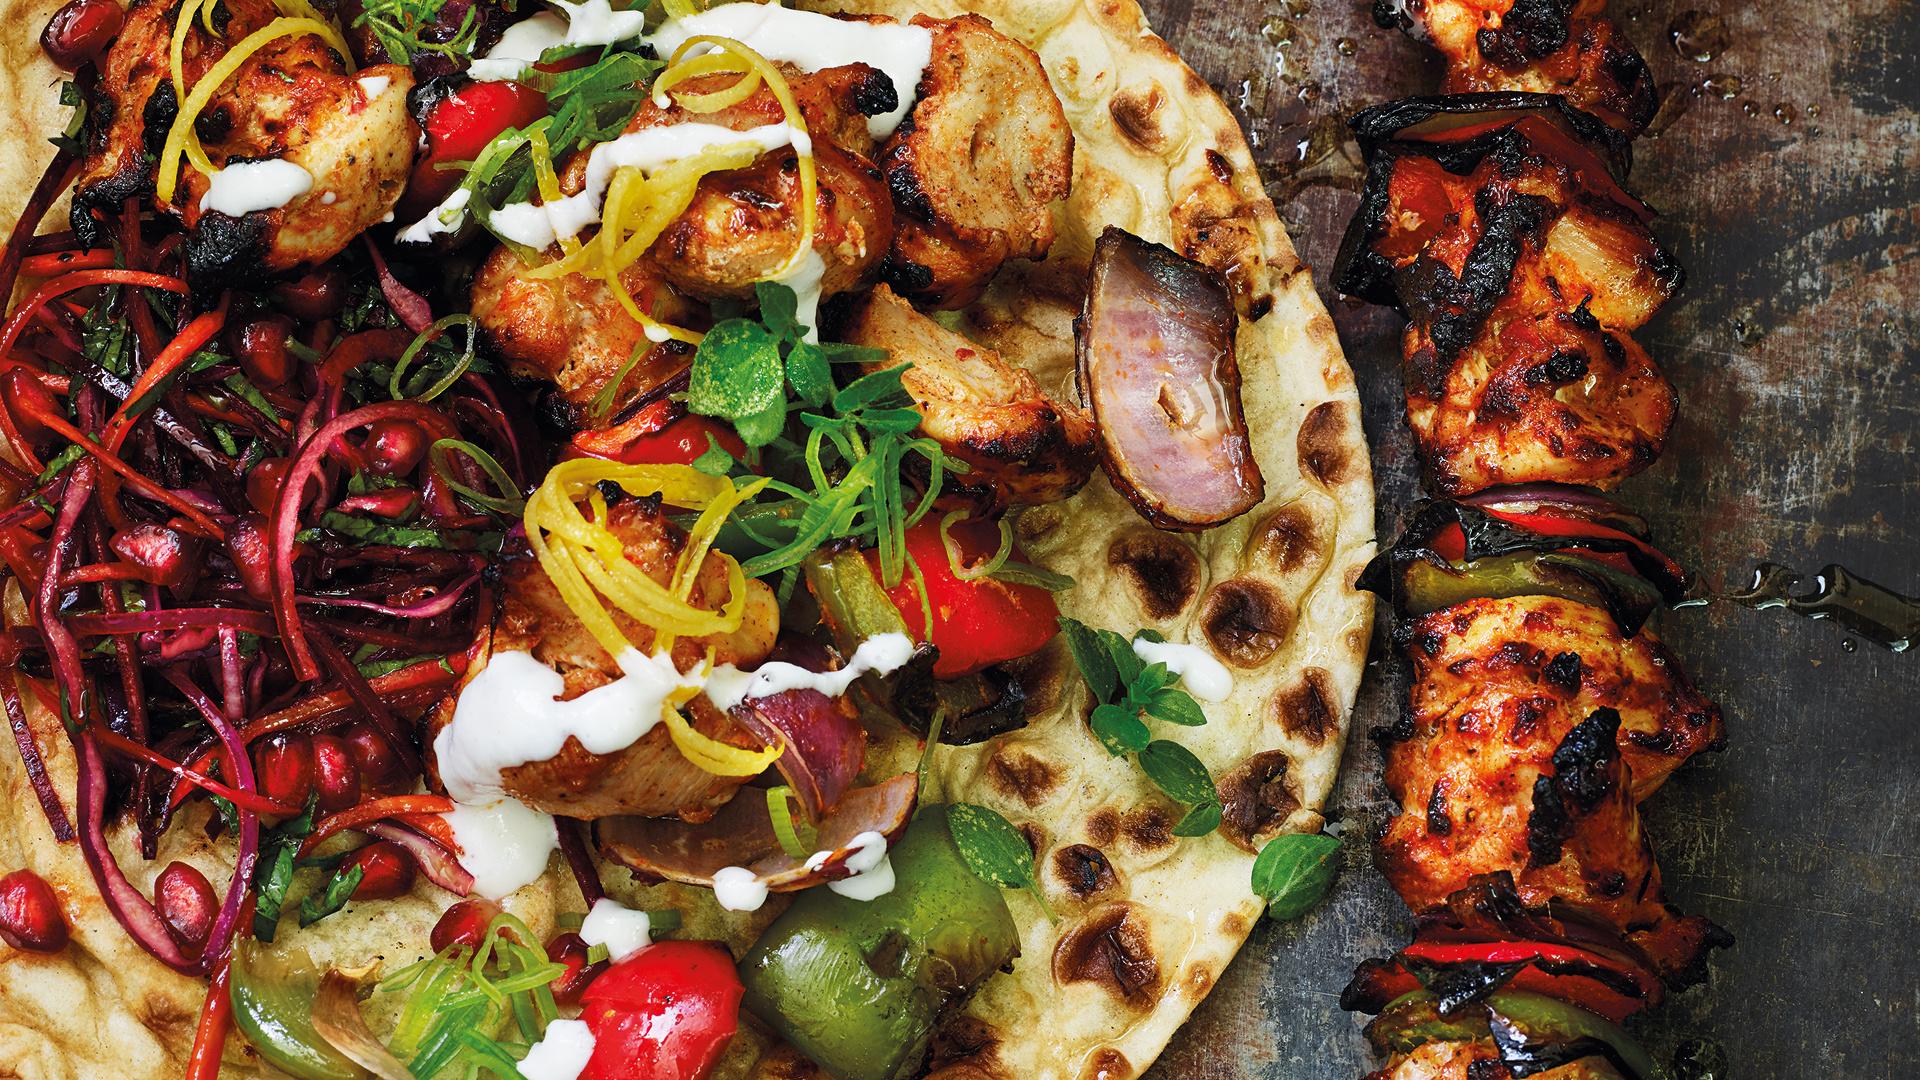 Berber & Q's buttermilk chicken shish kebab